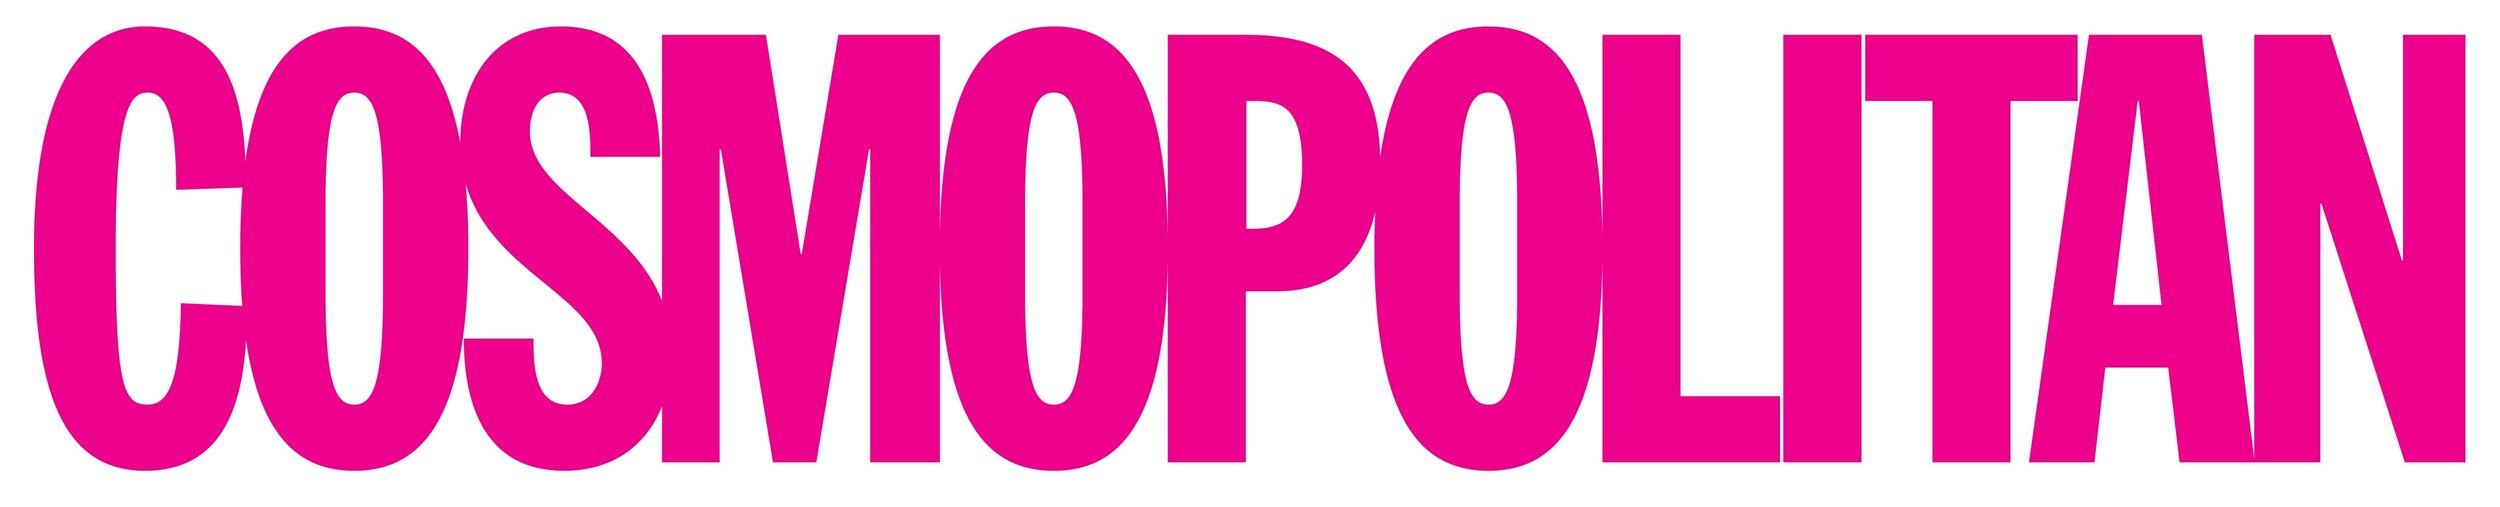 cosmopolitan-magazine-logo.jpg